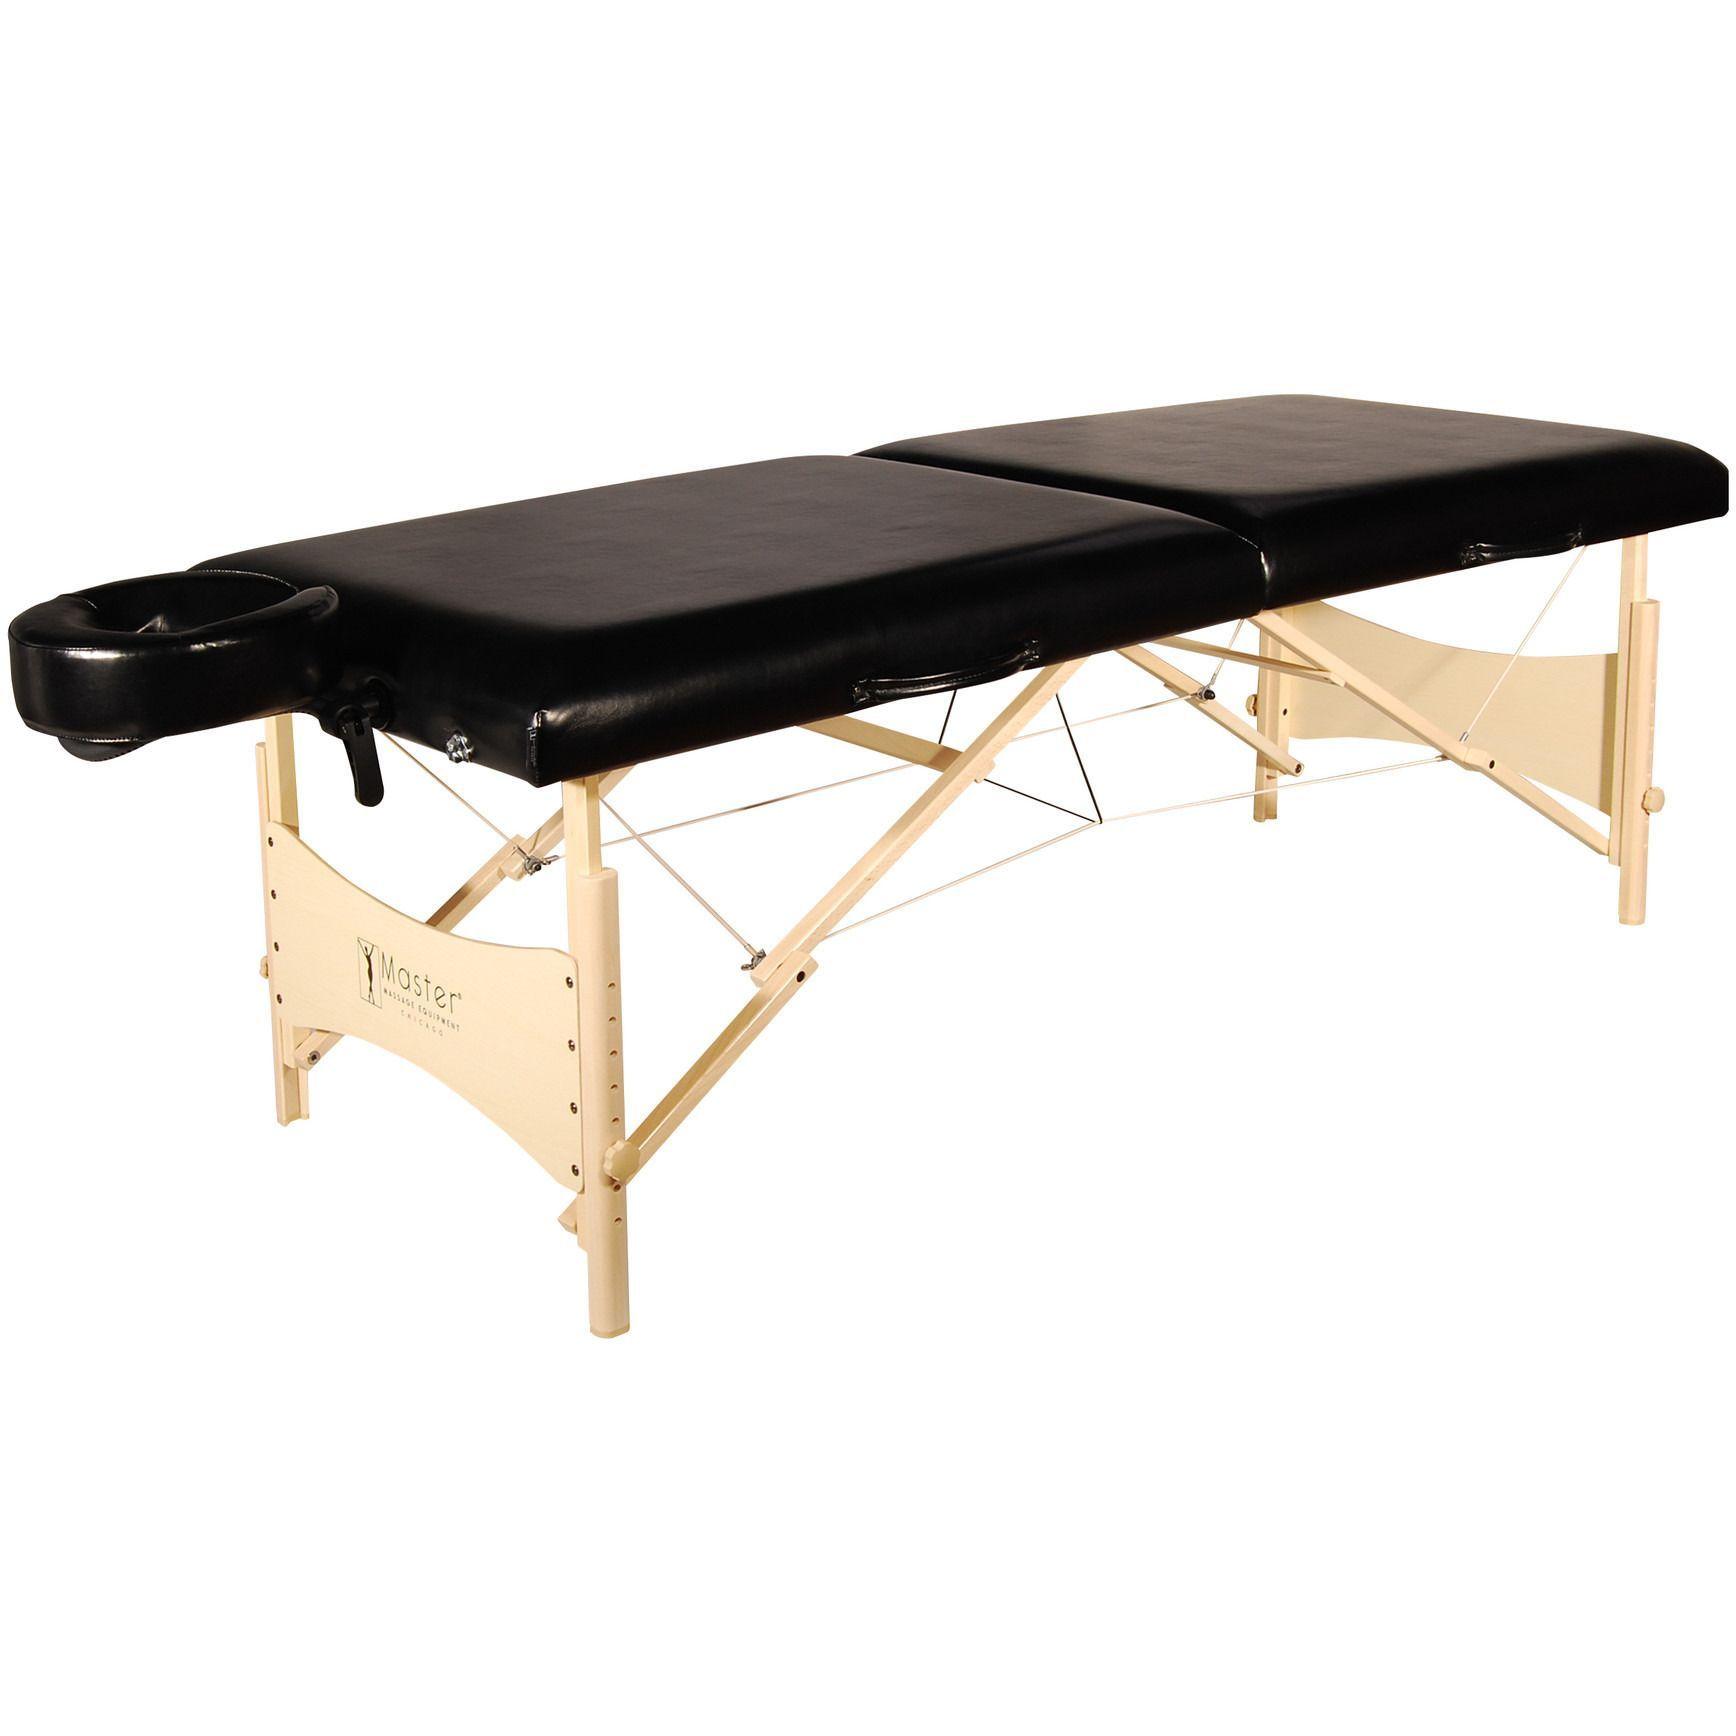 "30"" Balboa Pro Massage Table"